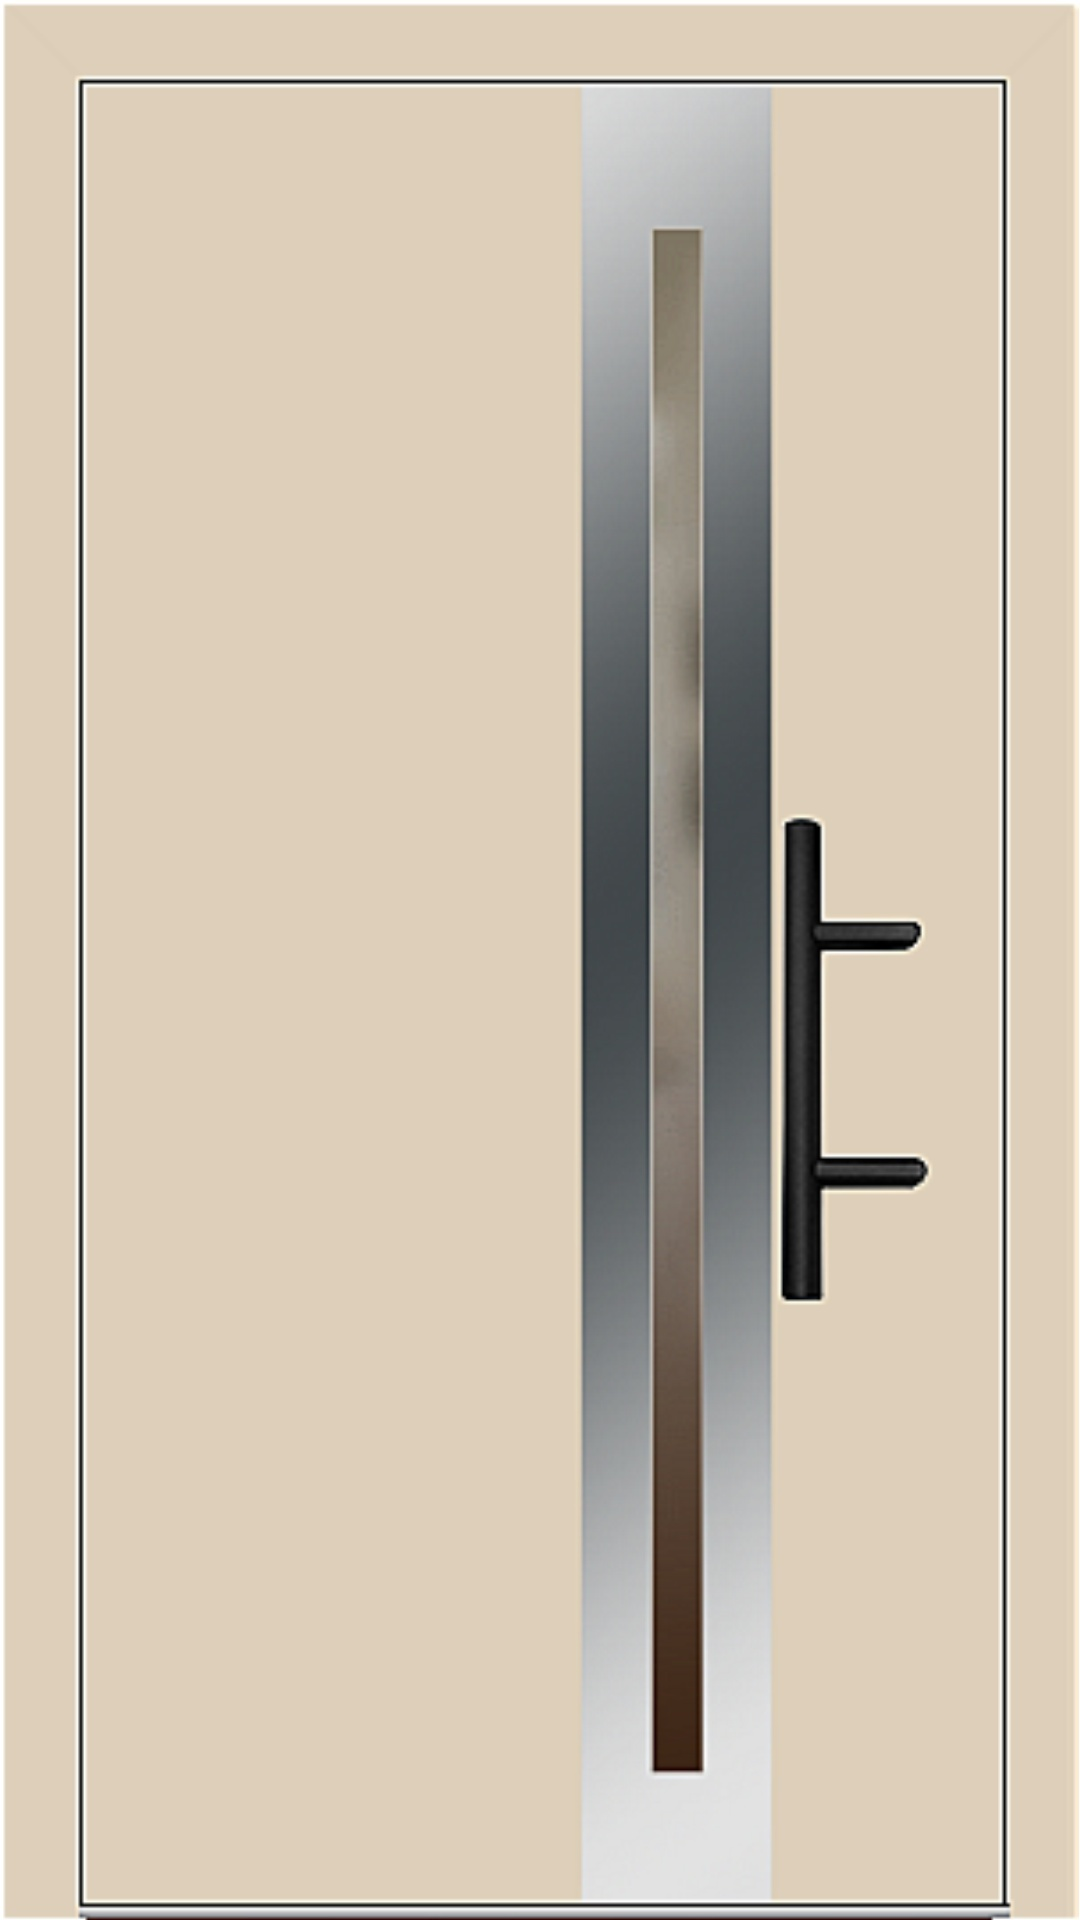 Holz-Alu Haustür Modell 66398 beige